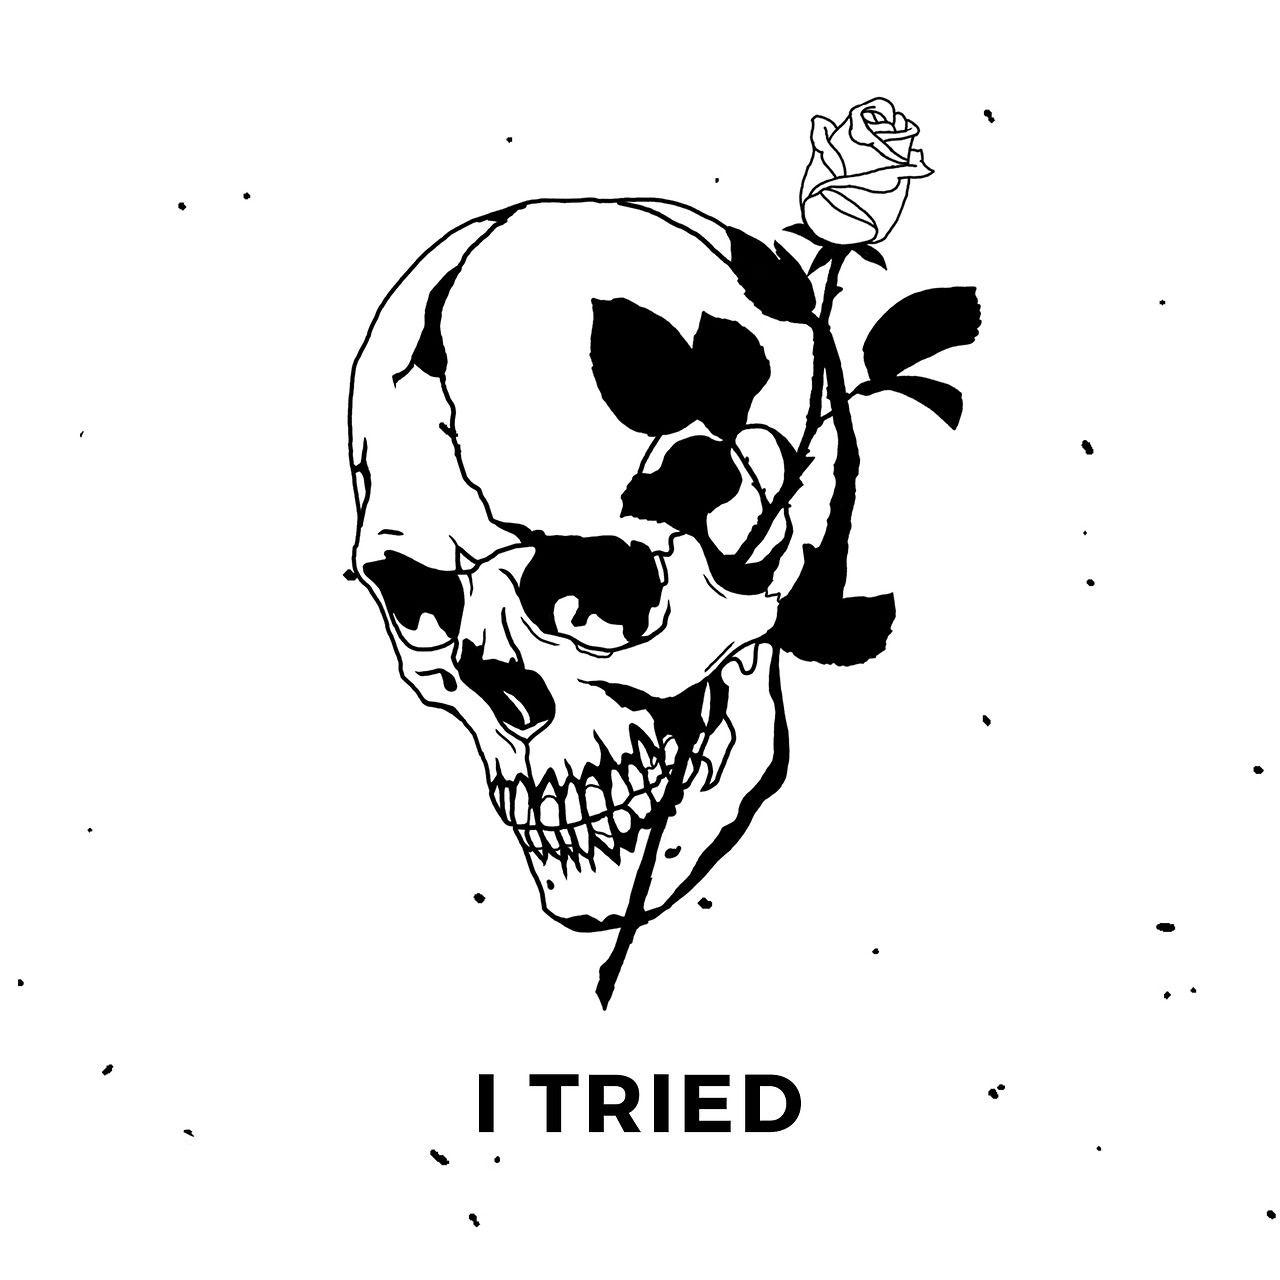 Skulls Tumblr Aesthetic: Tattoos, Skull Art, Drawings